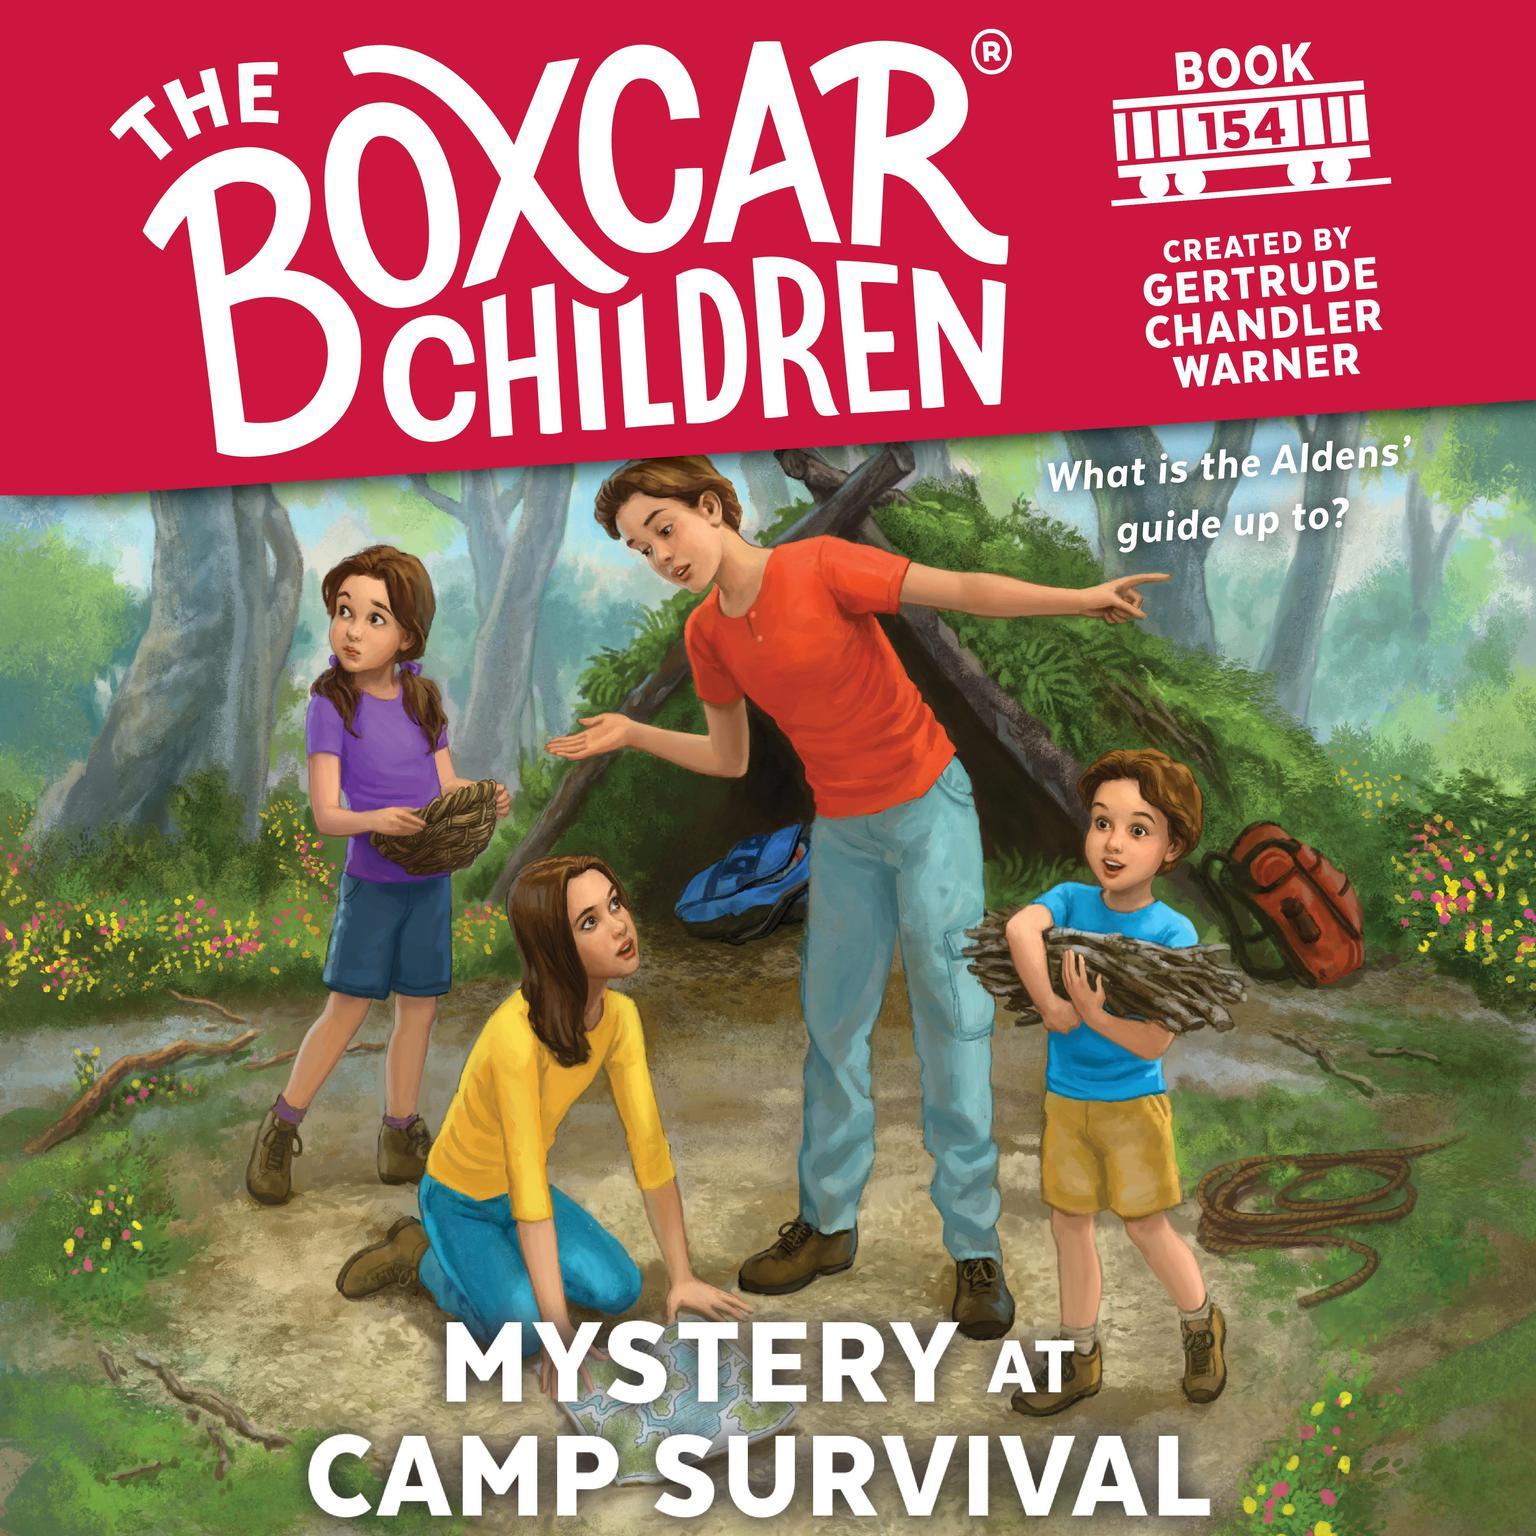 Mystery at Camp Survival Audiobook, by Gertrude Chandler Warner